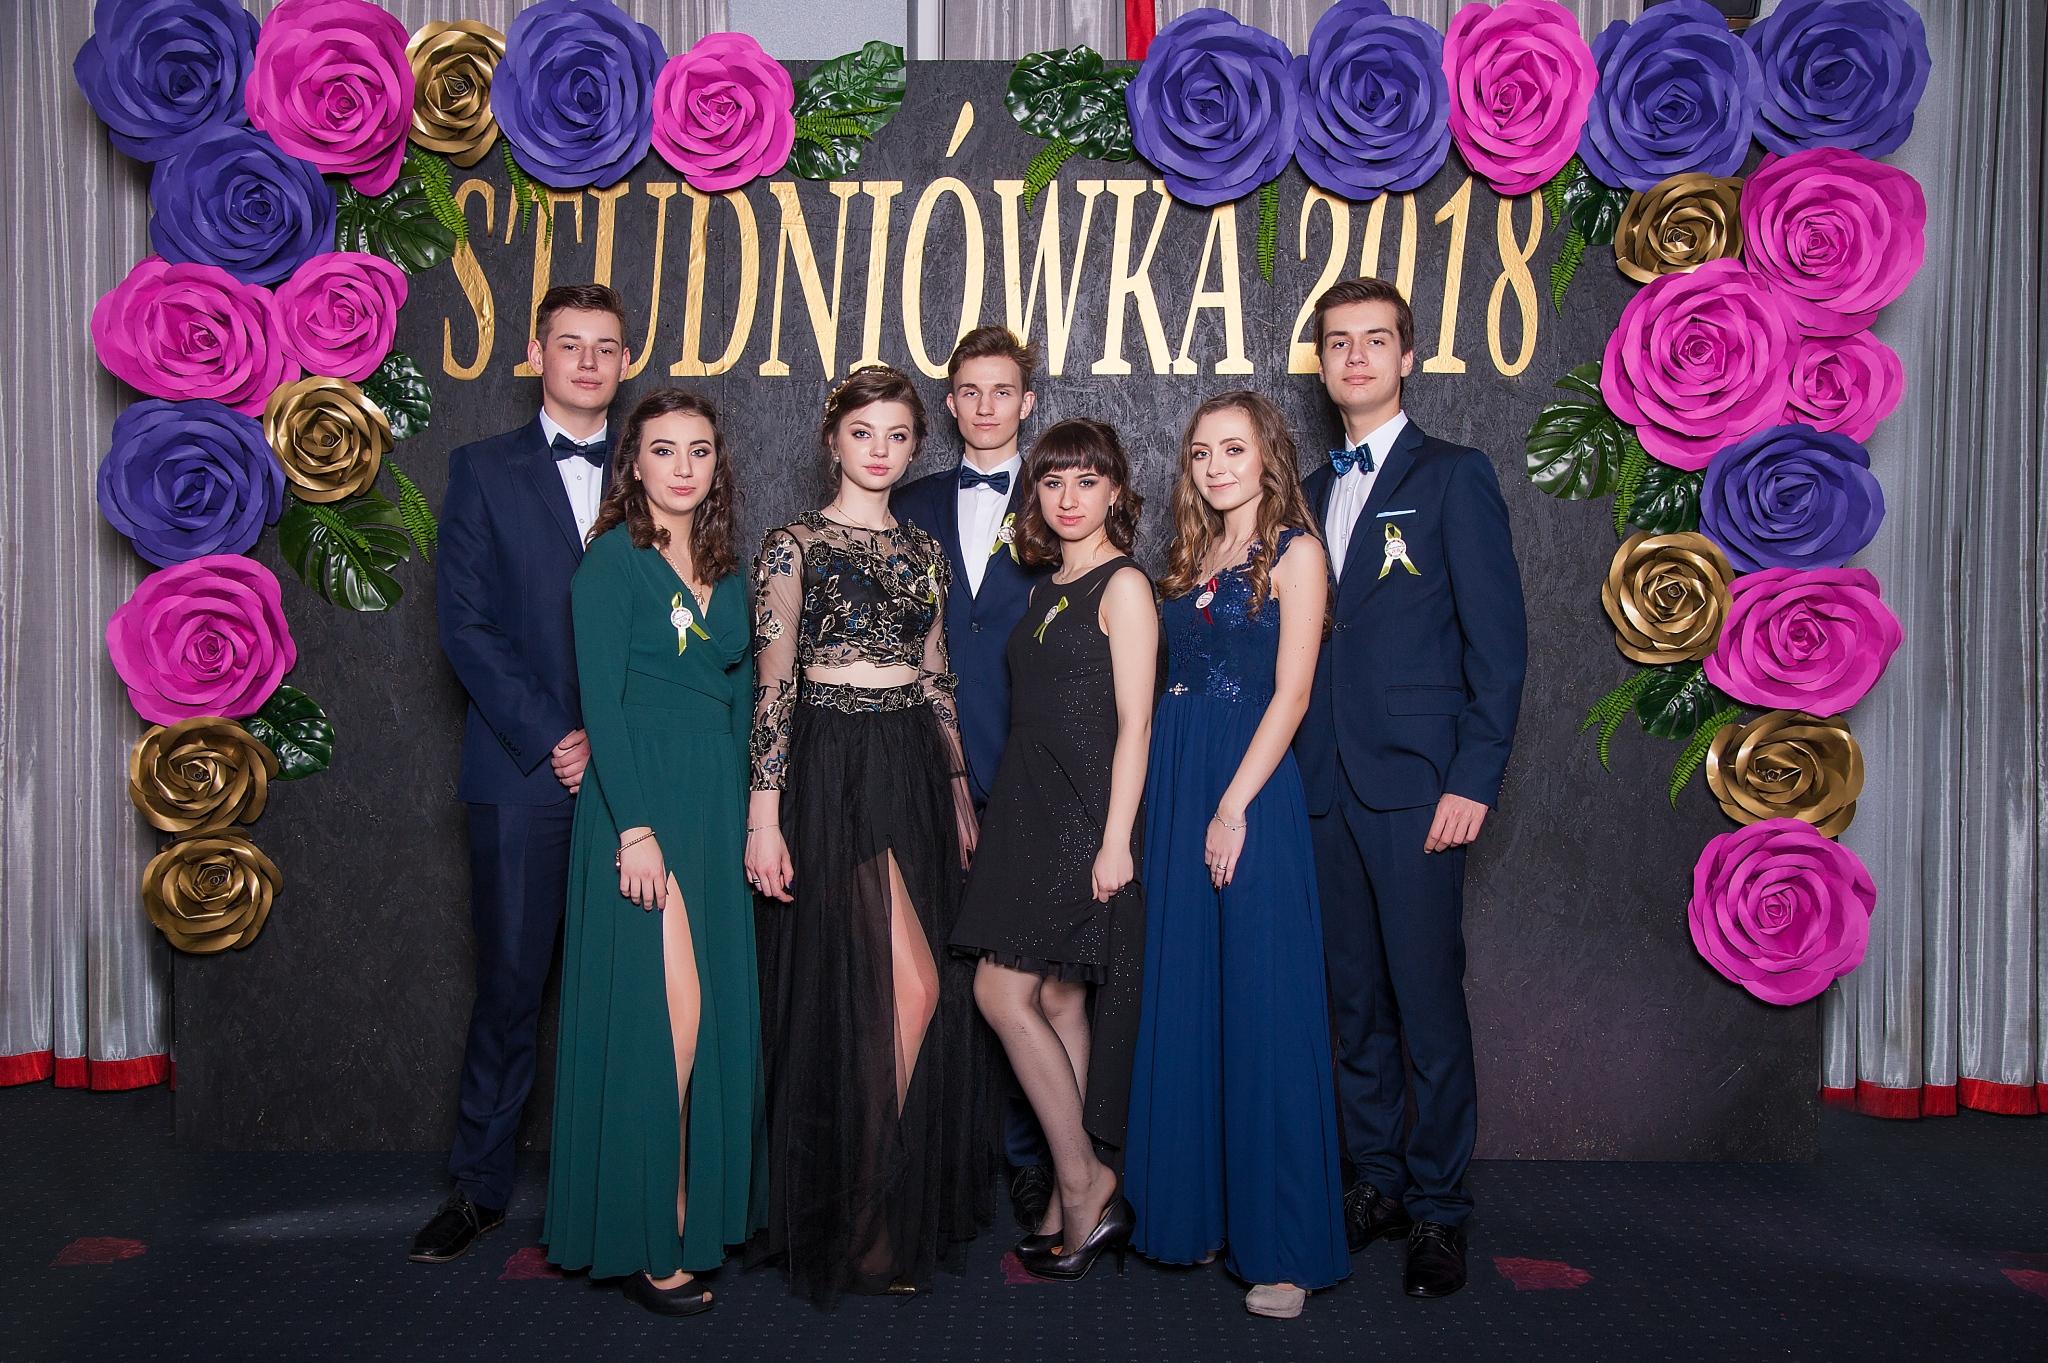 0126_100dniowka_studniowka_kalisz_IIILO_im_kopernika_zdjecia_par_scianka__7287.jpg